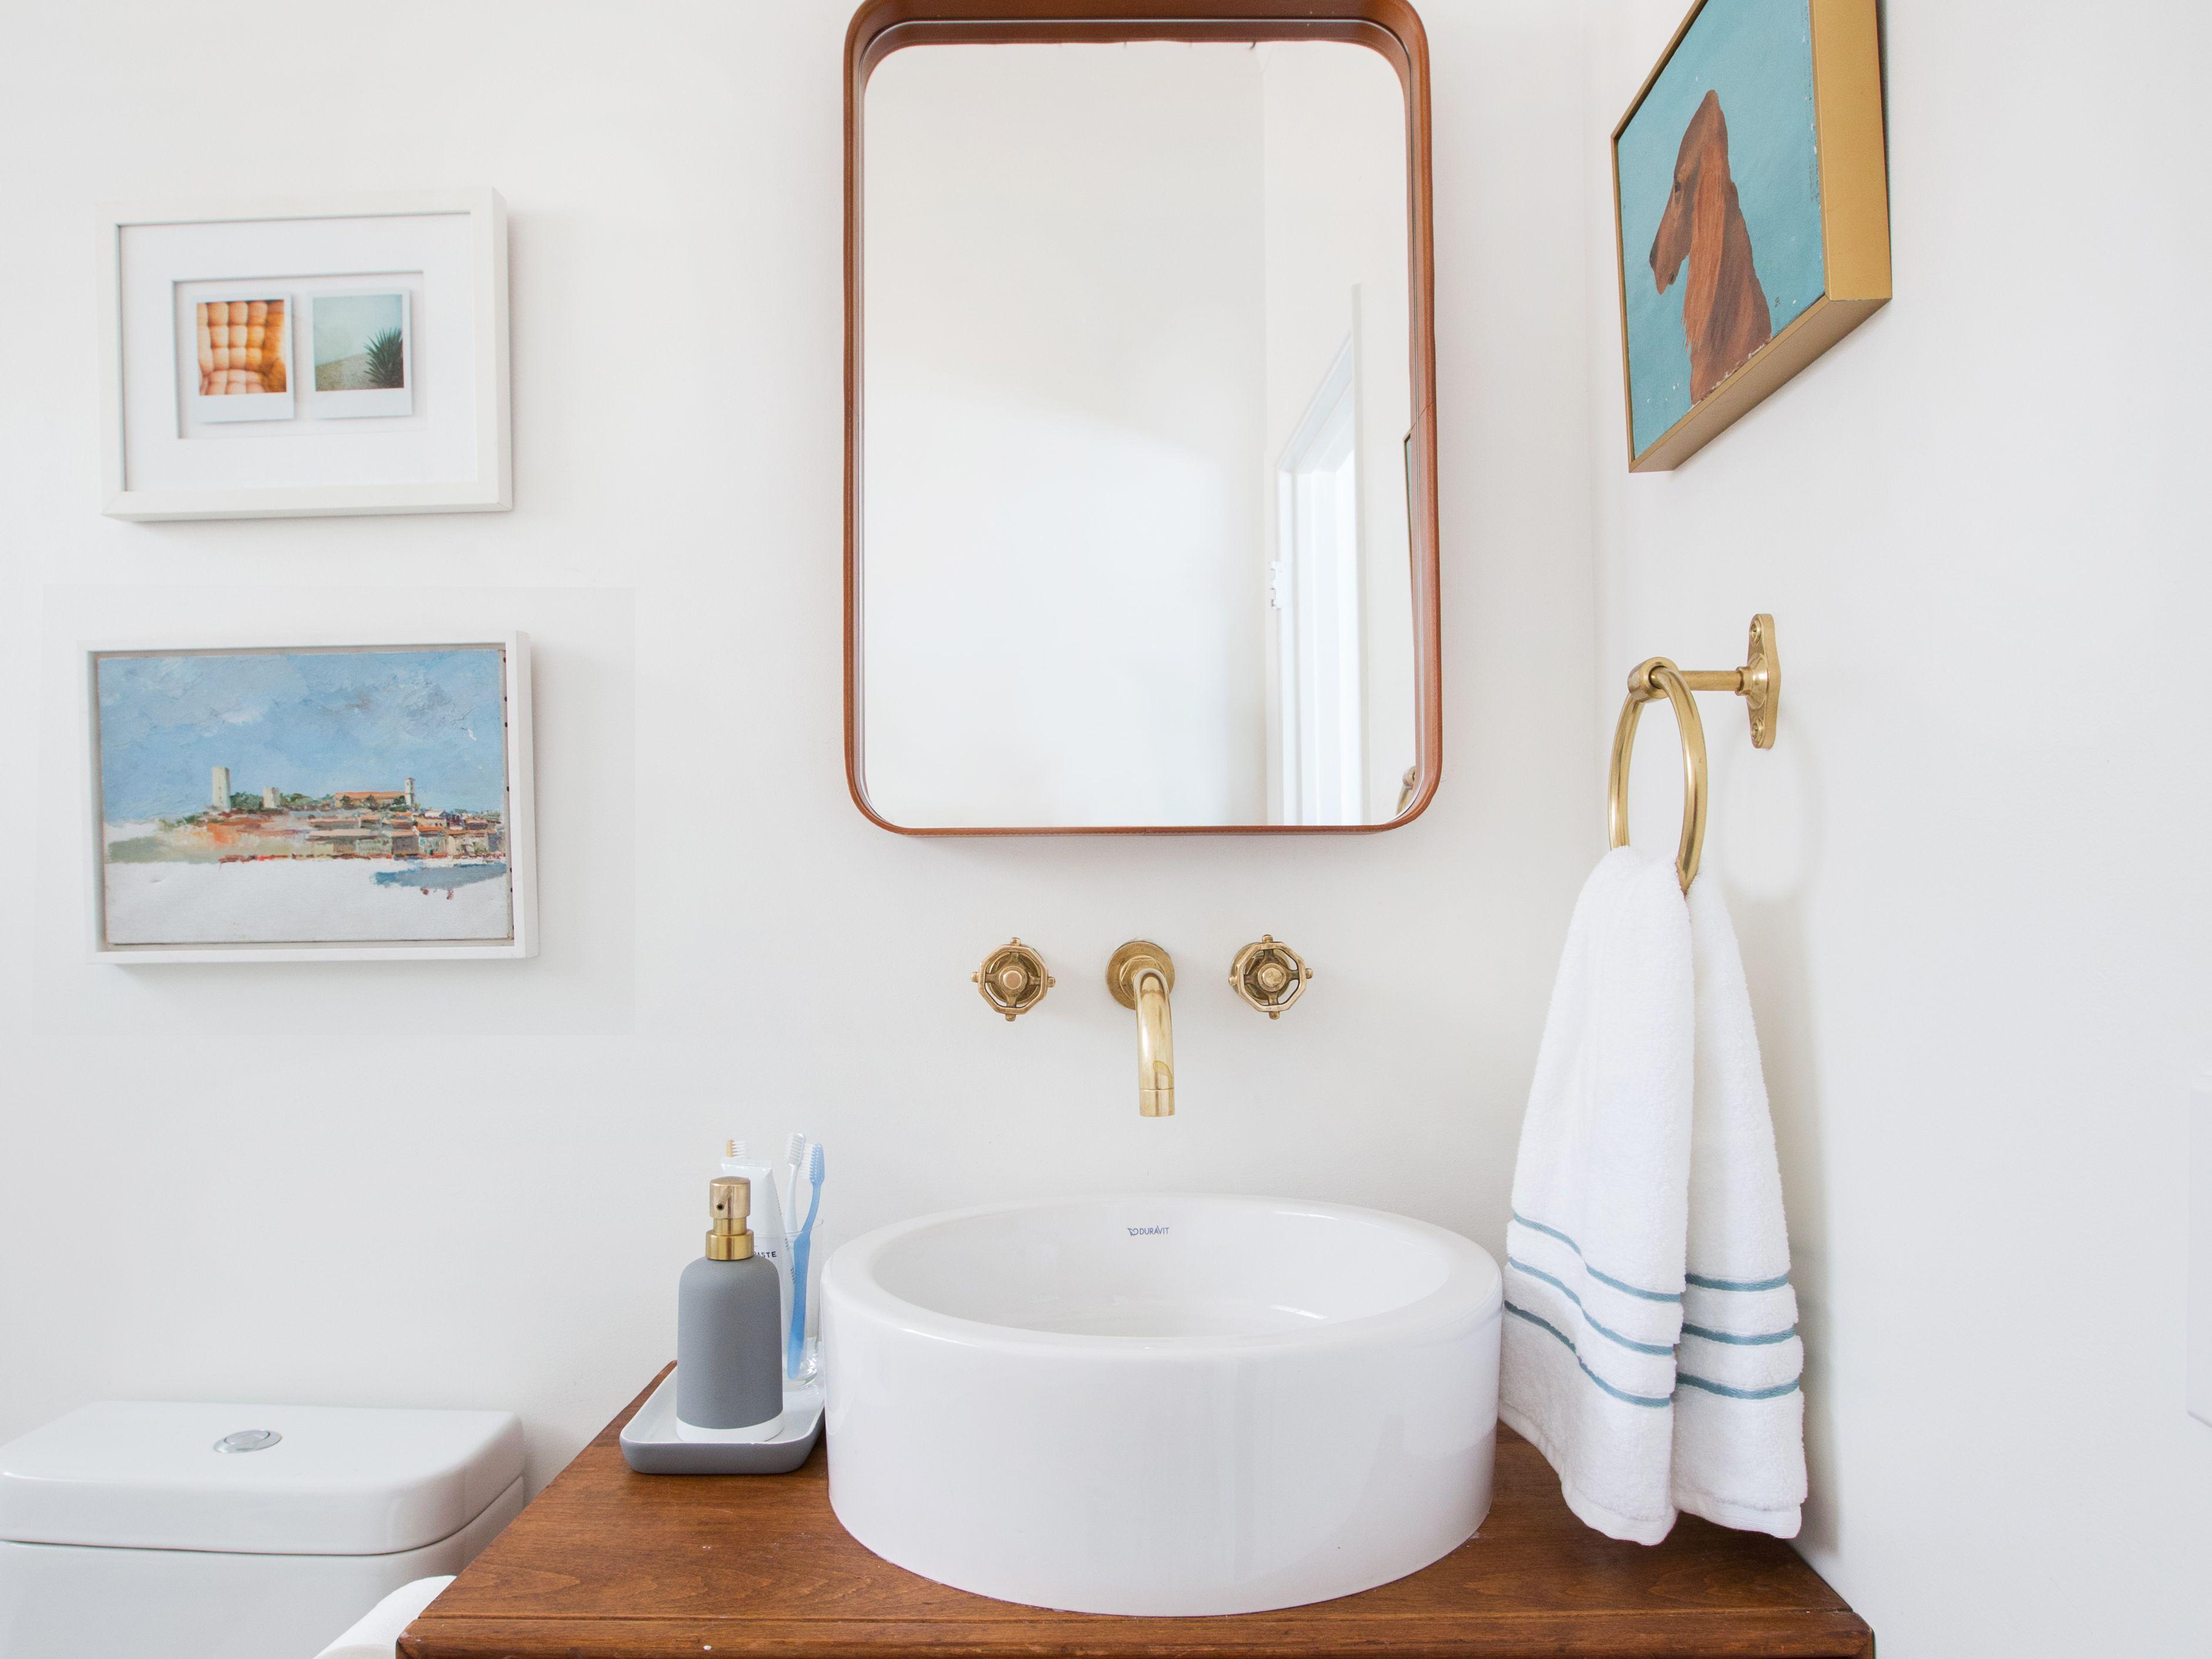 salle de bain minimaliste rangement vasque